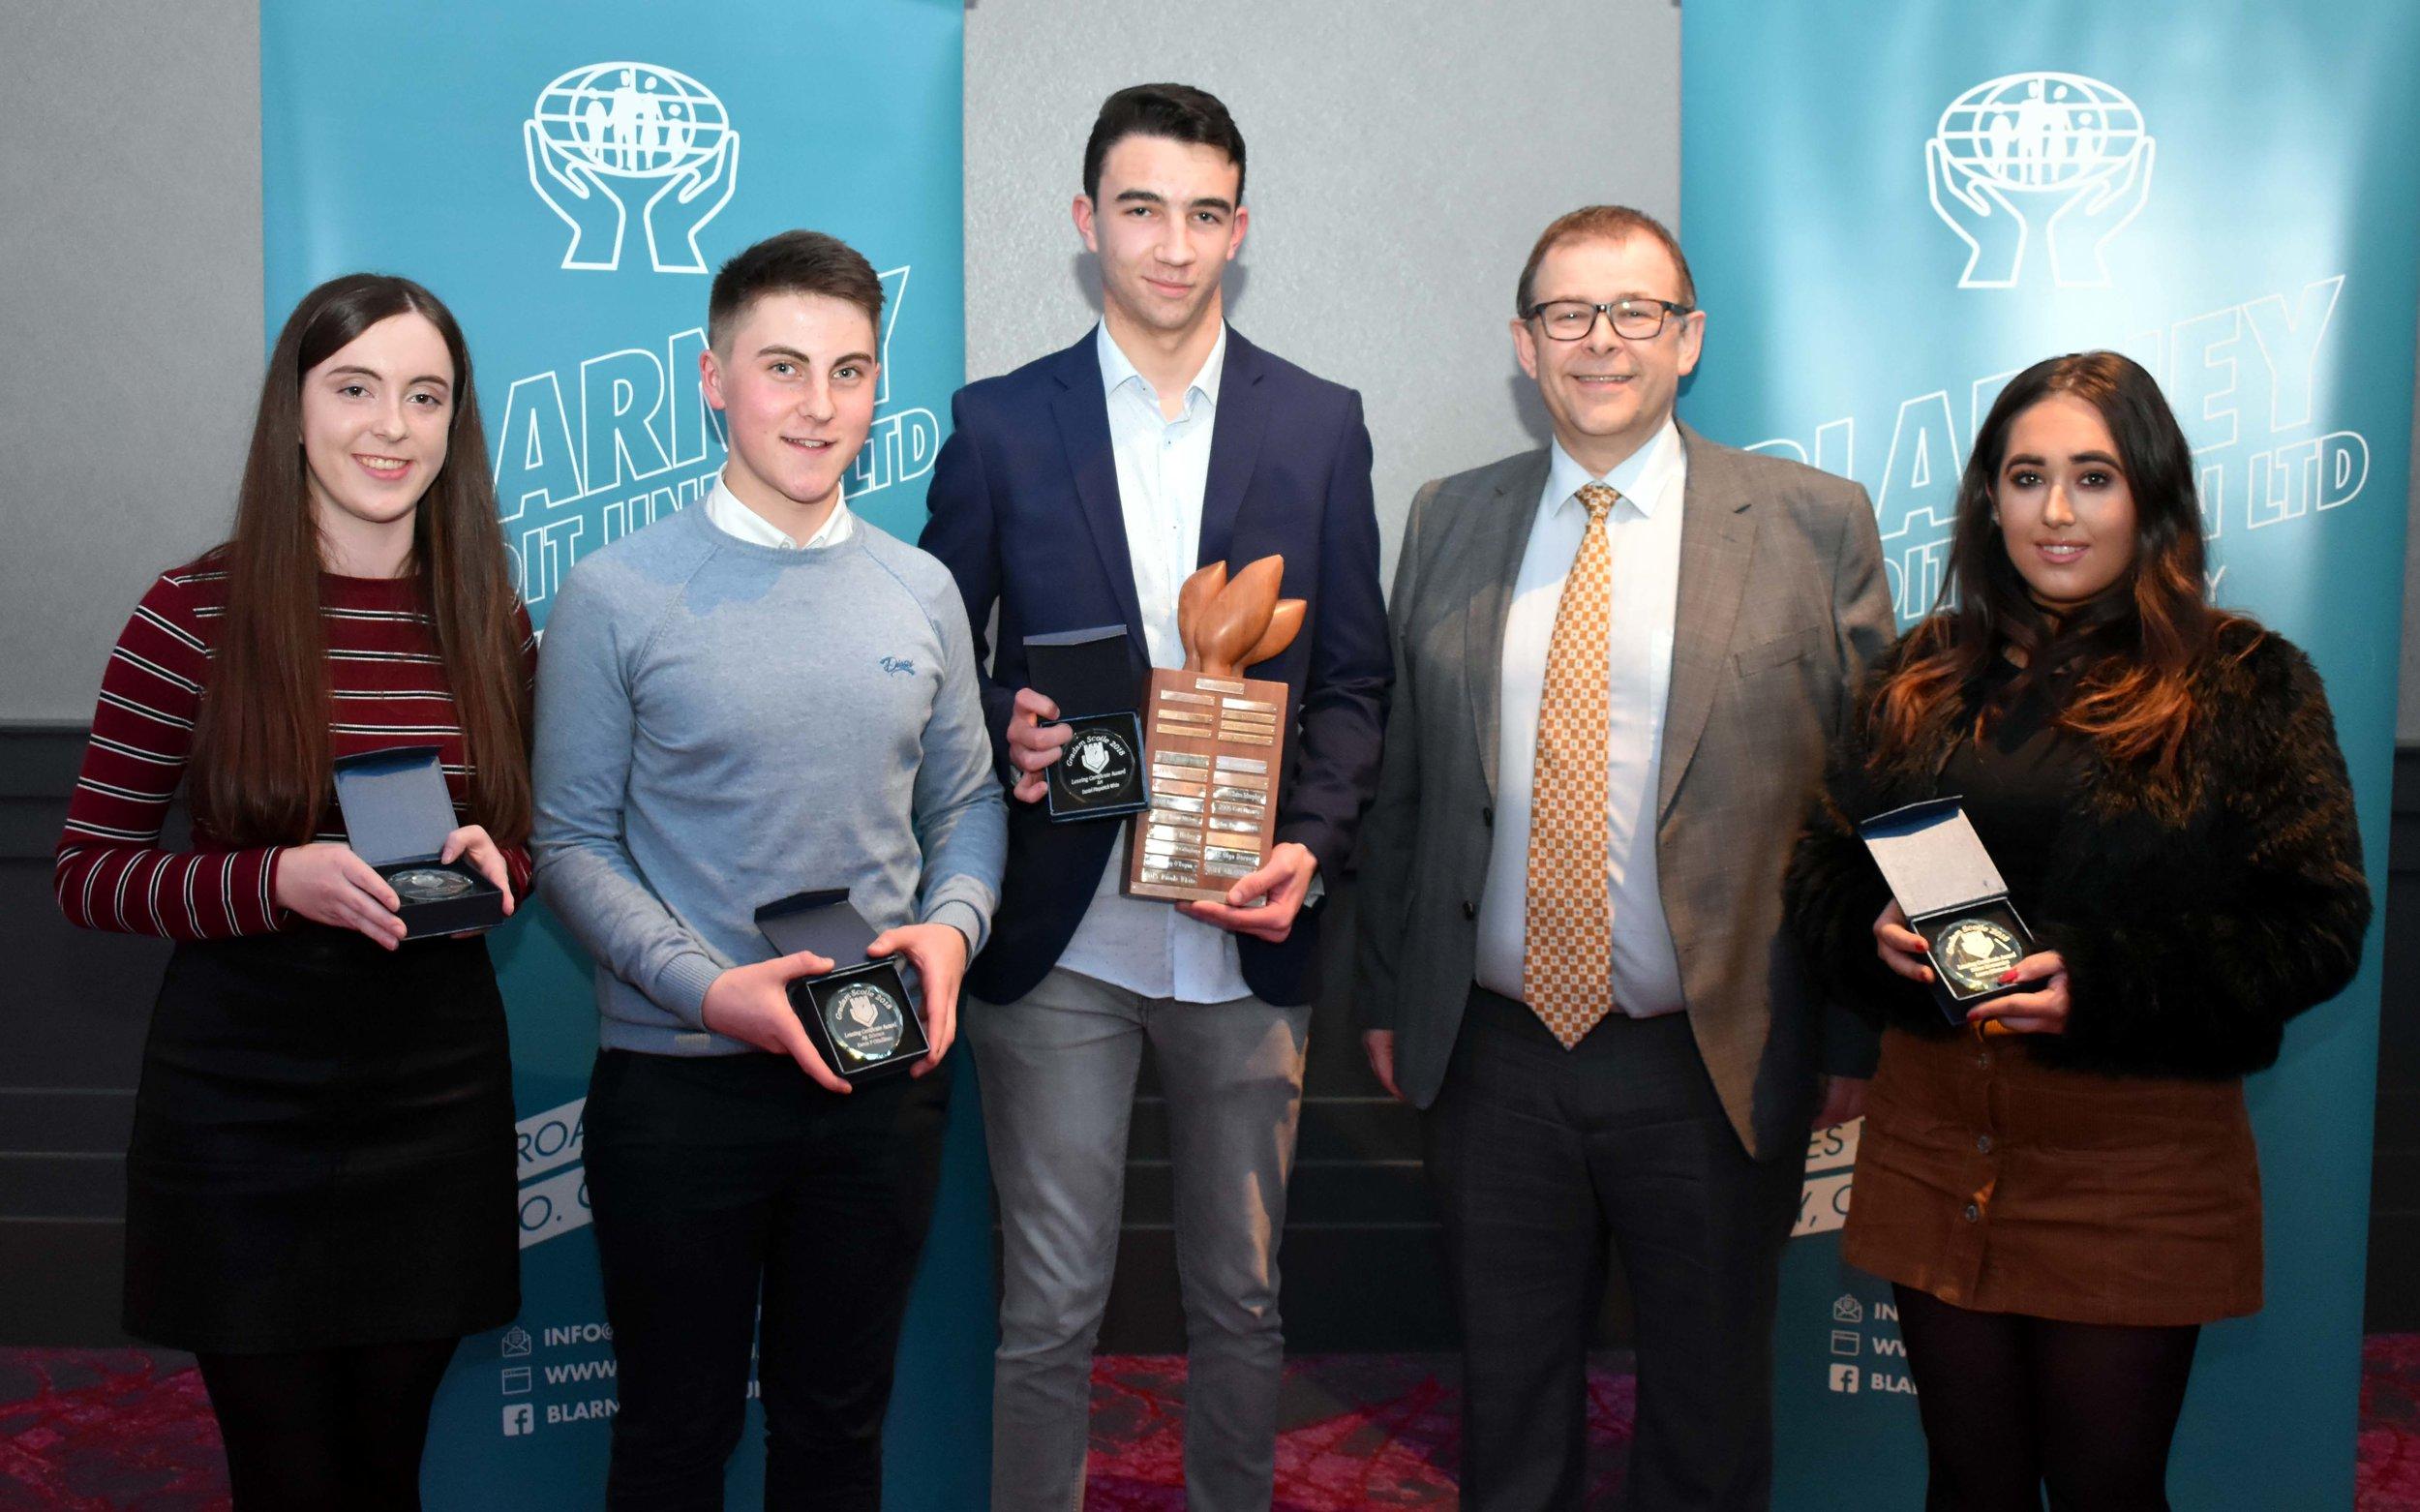 Senior Subject Award winners: Laoise Gavin (Chemistry), Denis O' Sullivan (Ag. Science), Daniel Fitzpatrick -White (Art), Laura O' Driscoll (Home Economics) (Pictured with Mr. Mark McGloughlin - BOM and Blarney Credit Union)